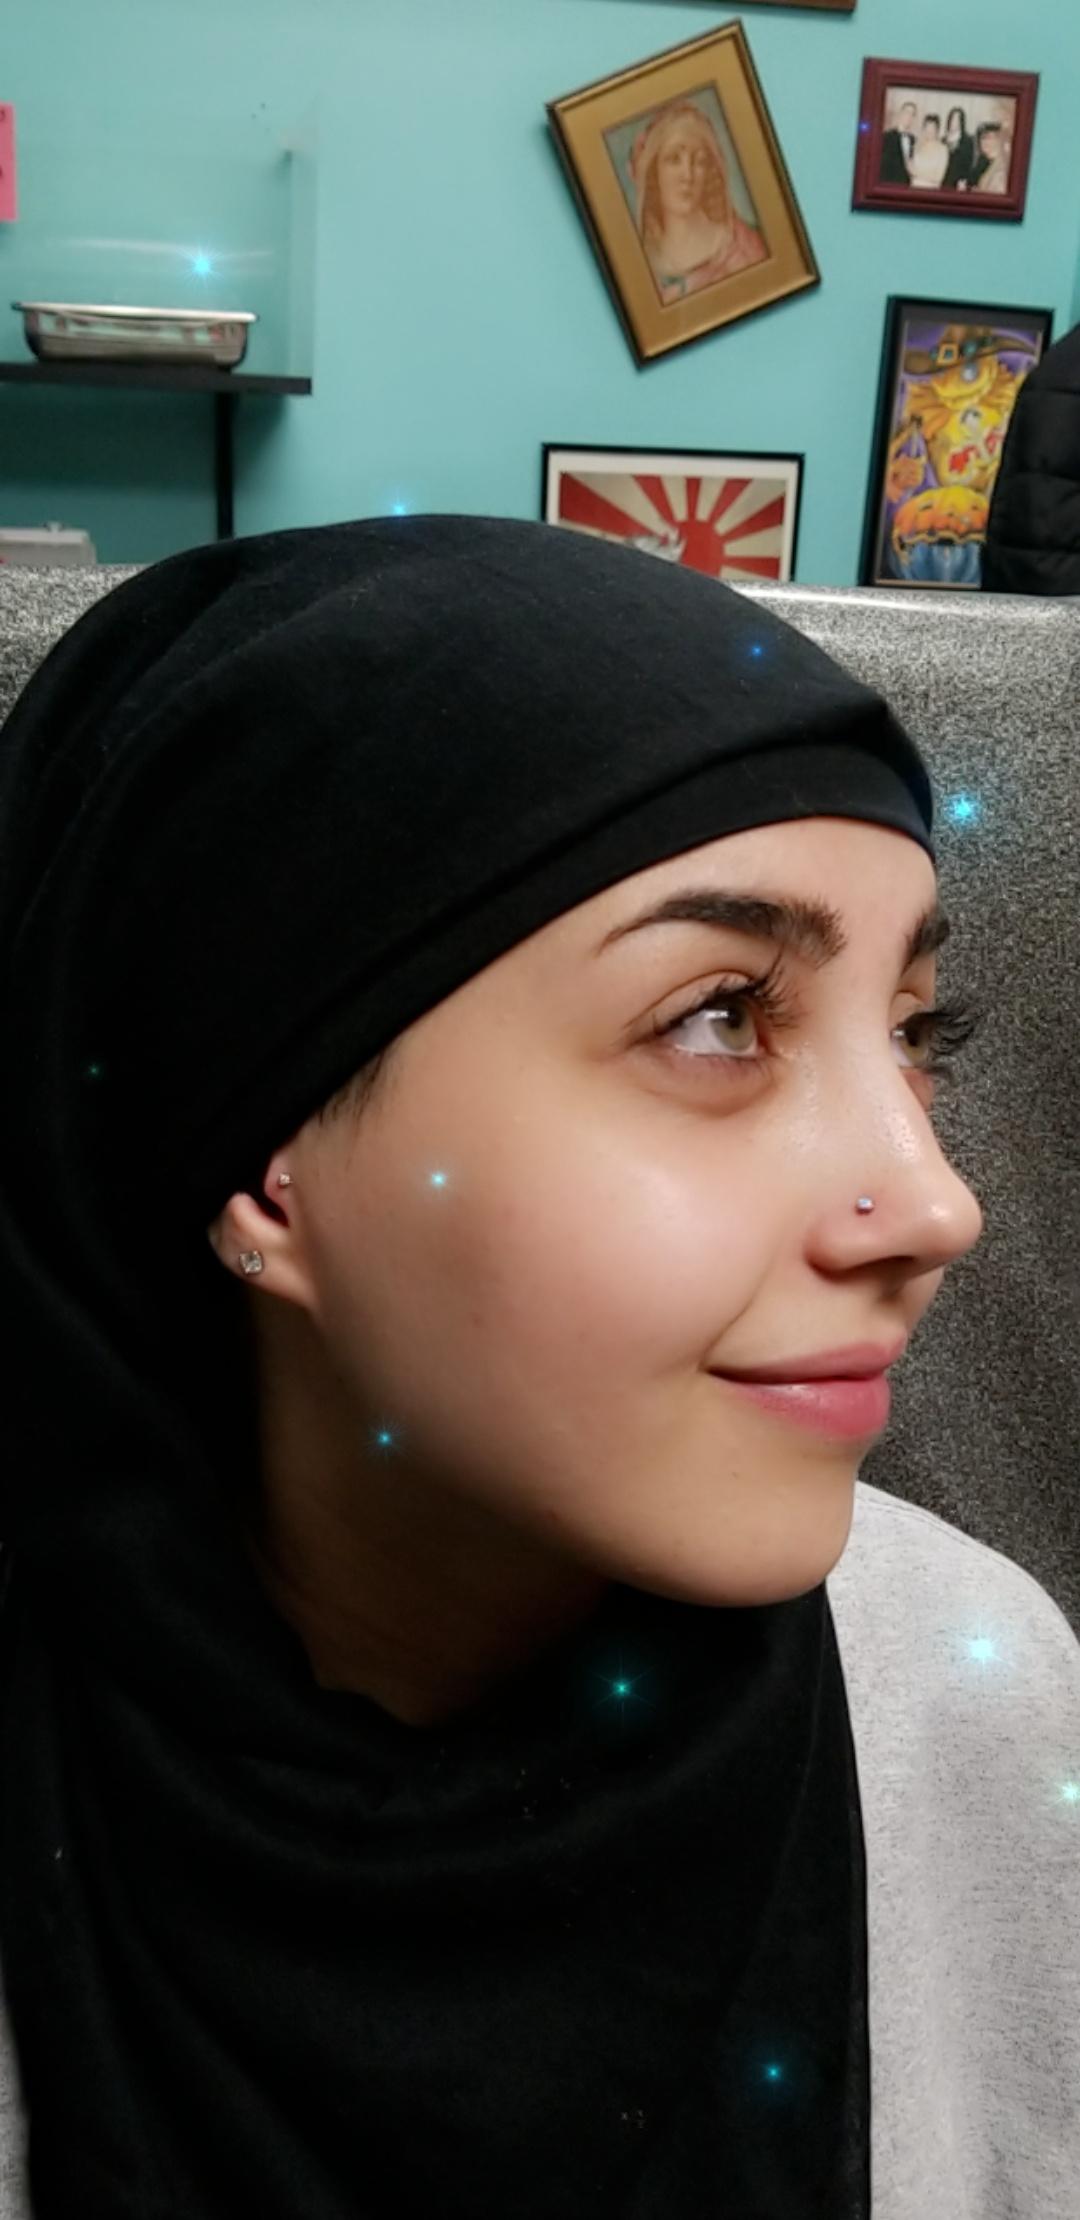 3mm NeoMetal Nose